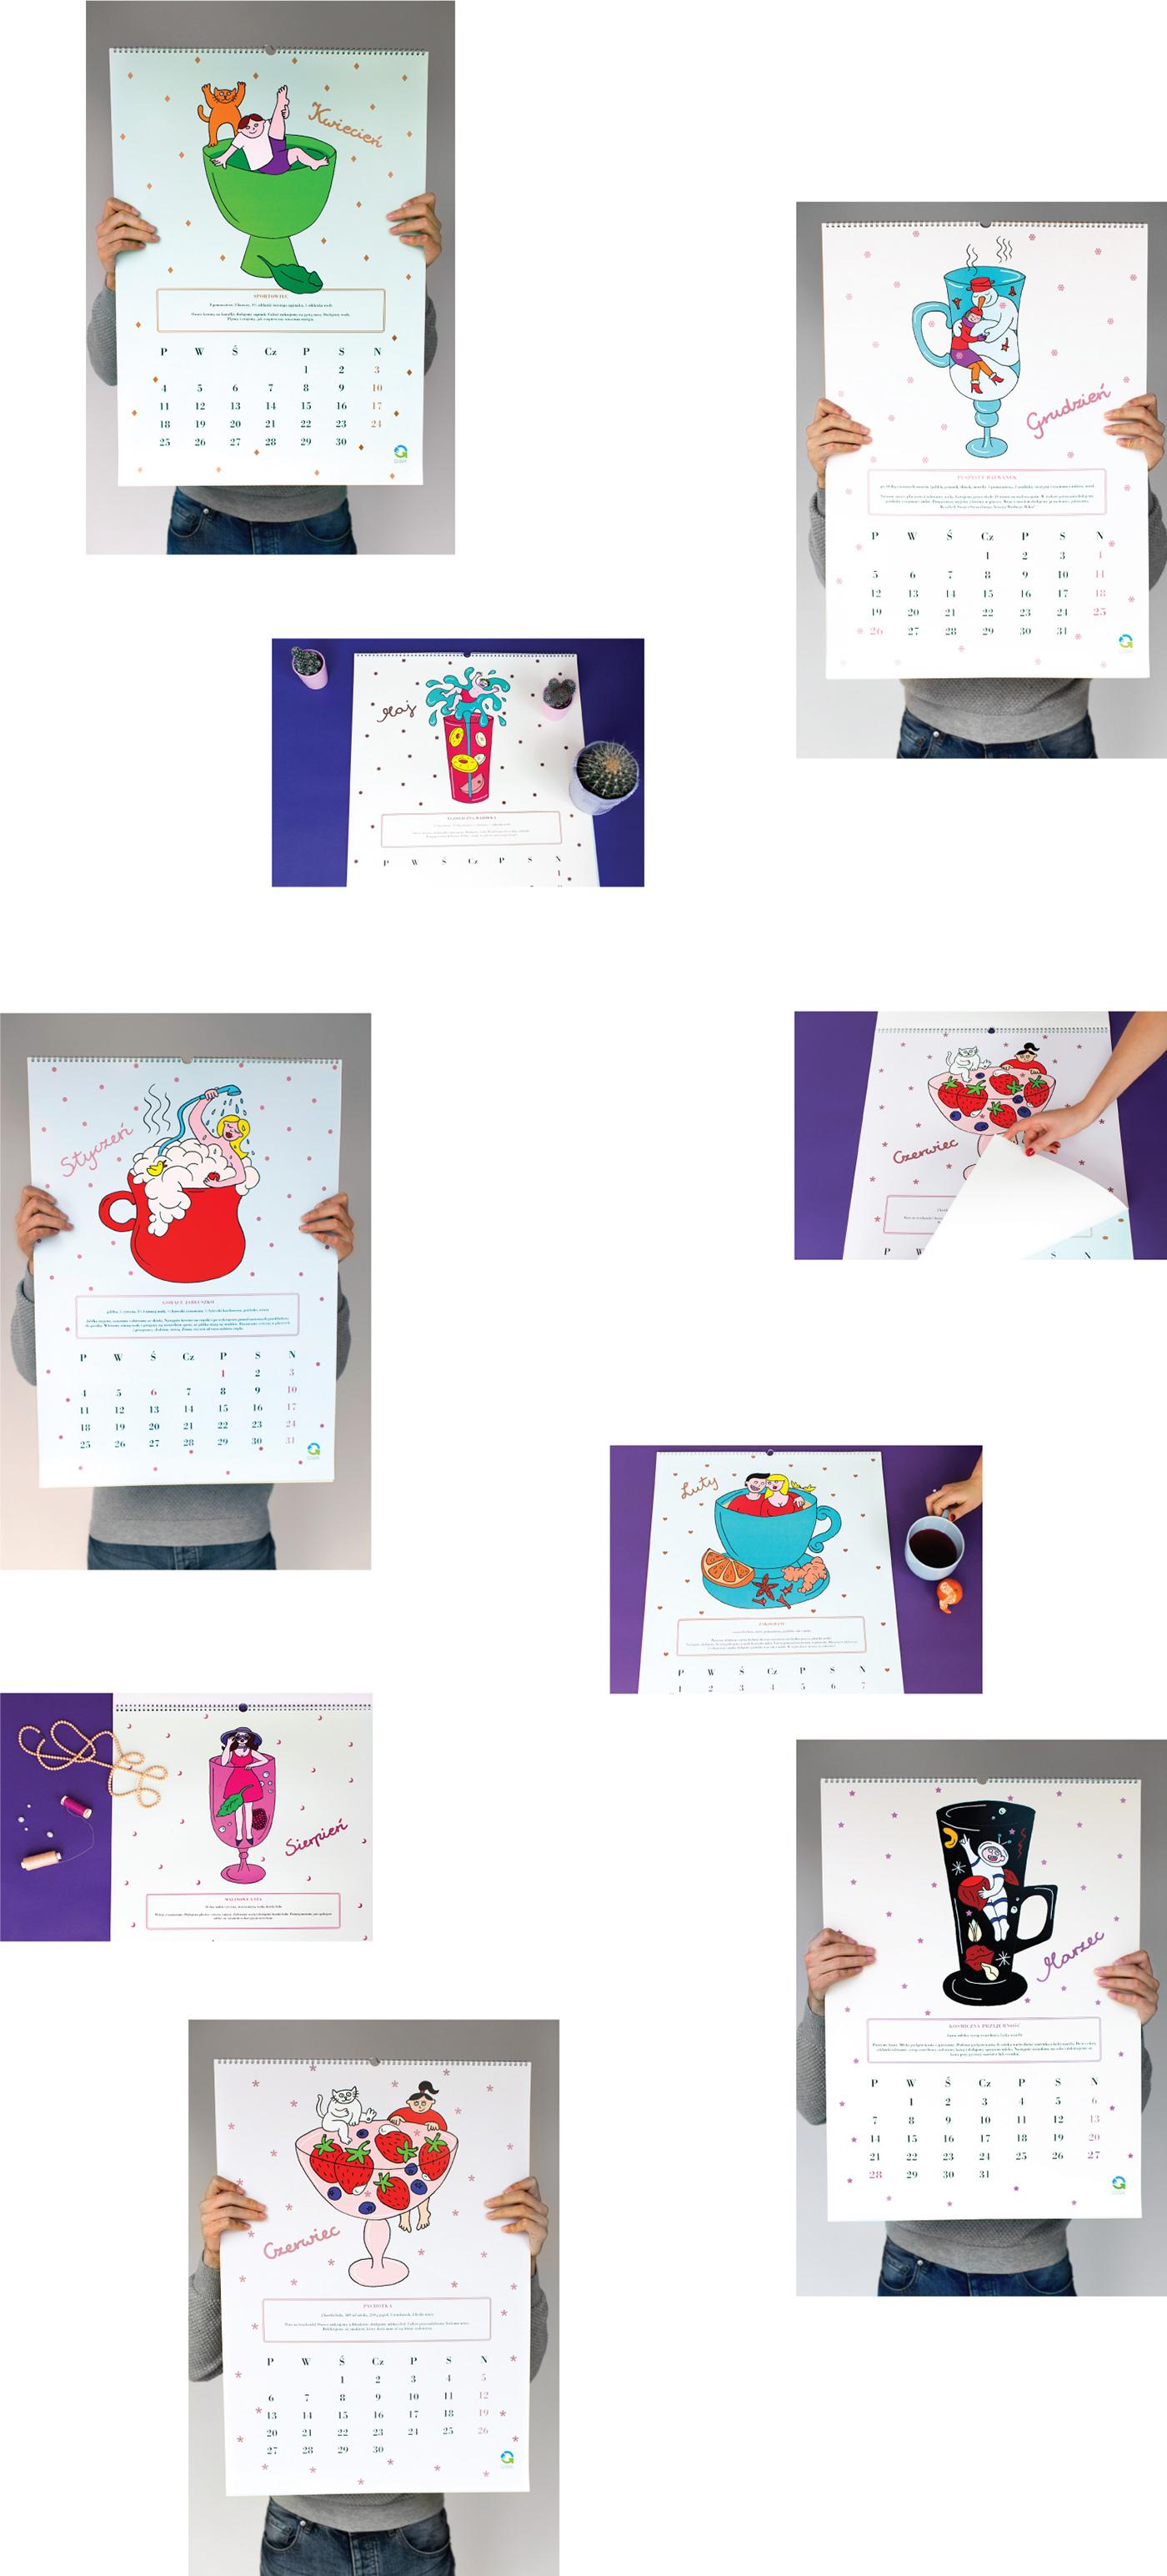 calendar ceramics  water recipe Liquid cup drink sewer Character Hero swimming Fun bath Love sexy